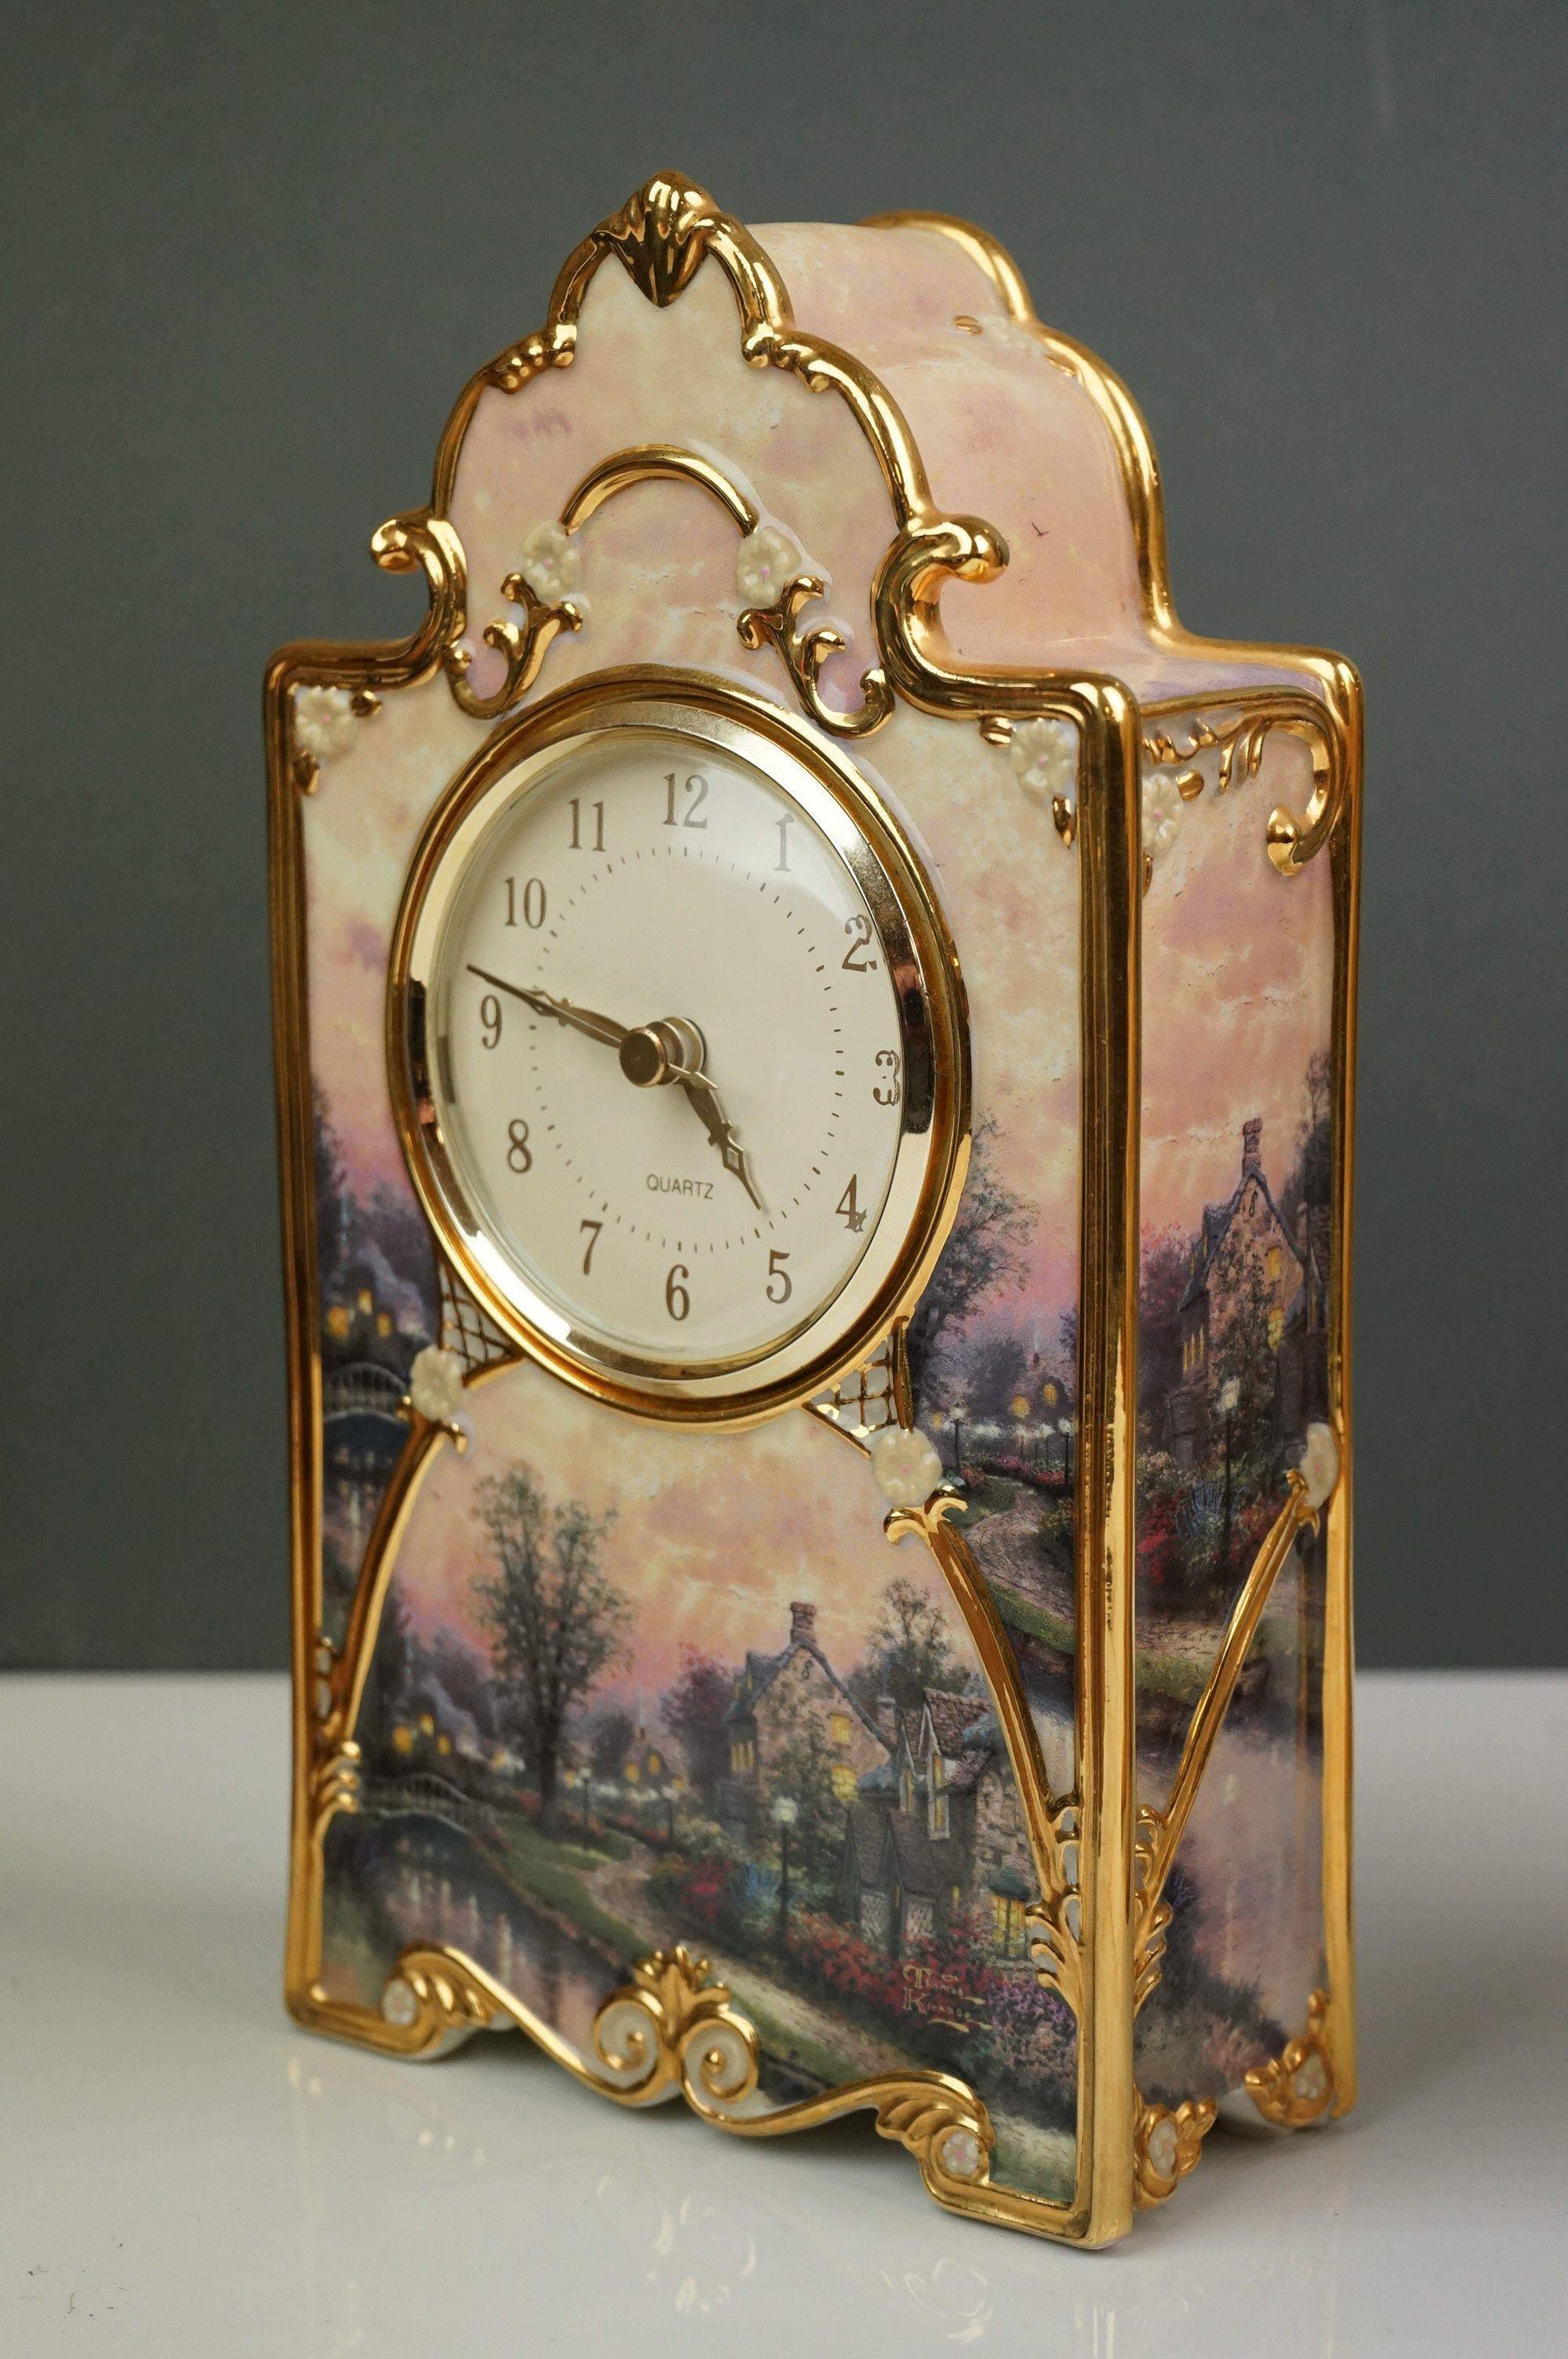 Bradford Exchange Lamplight Lane Heirloom porcelain clock by Thomas Kinkade, issue no. A9321, - Image 4 of 9